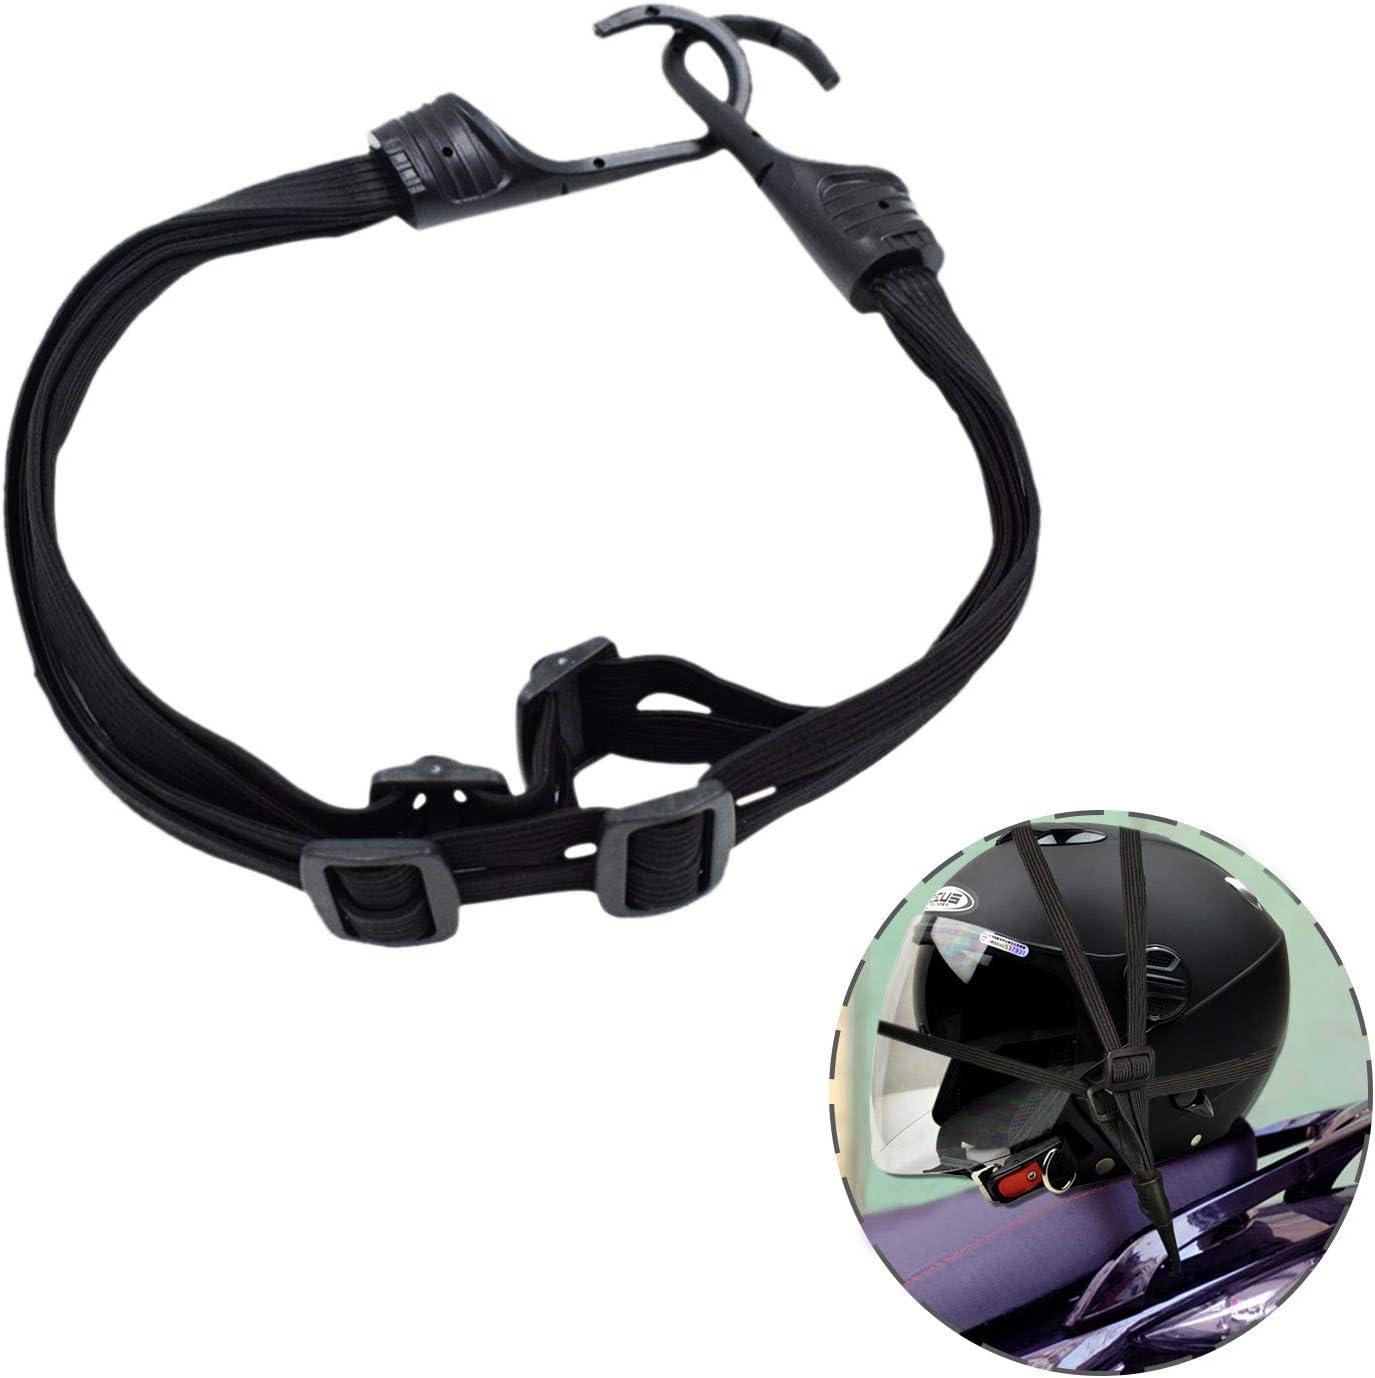 Dogxiong 60cm Motorcycle Luggage Net Helmet Elastic Rope,Retractable Cord 2 Hooks Elastic Rope Strap for Motorcycle Helmet Luggage